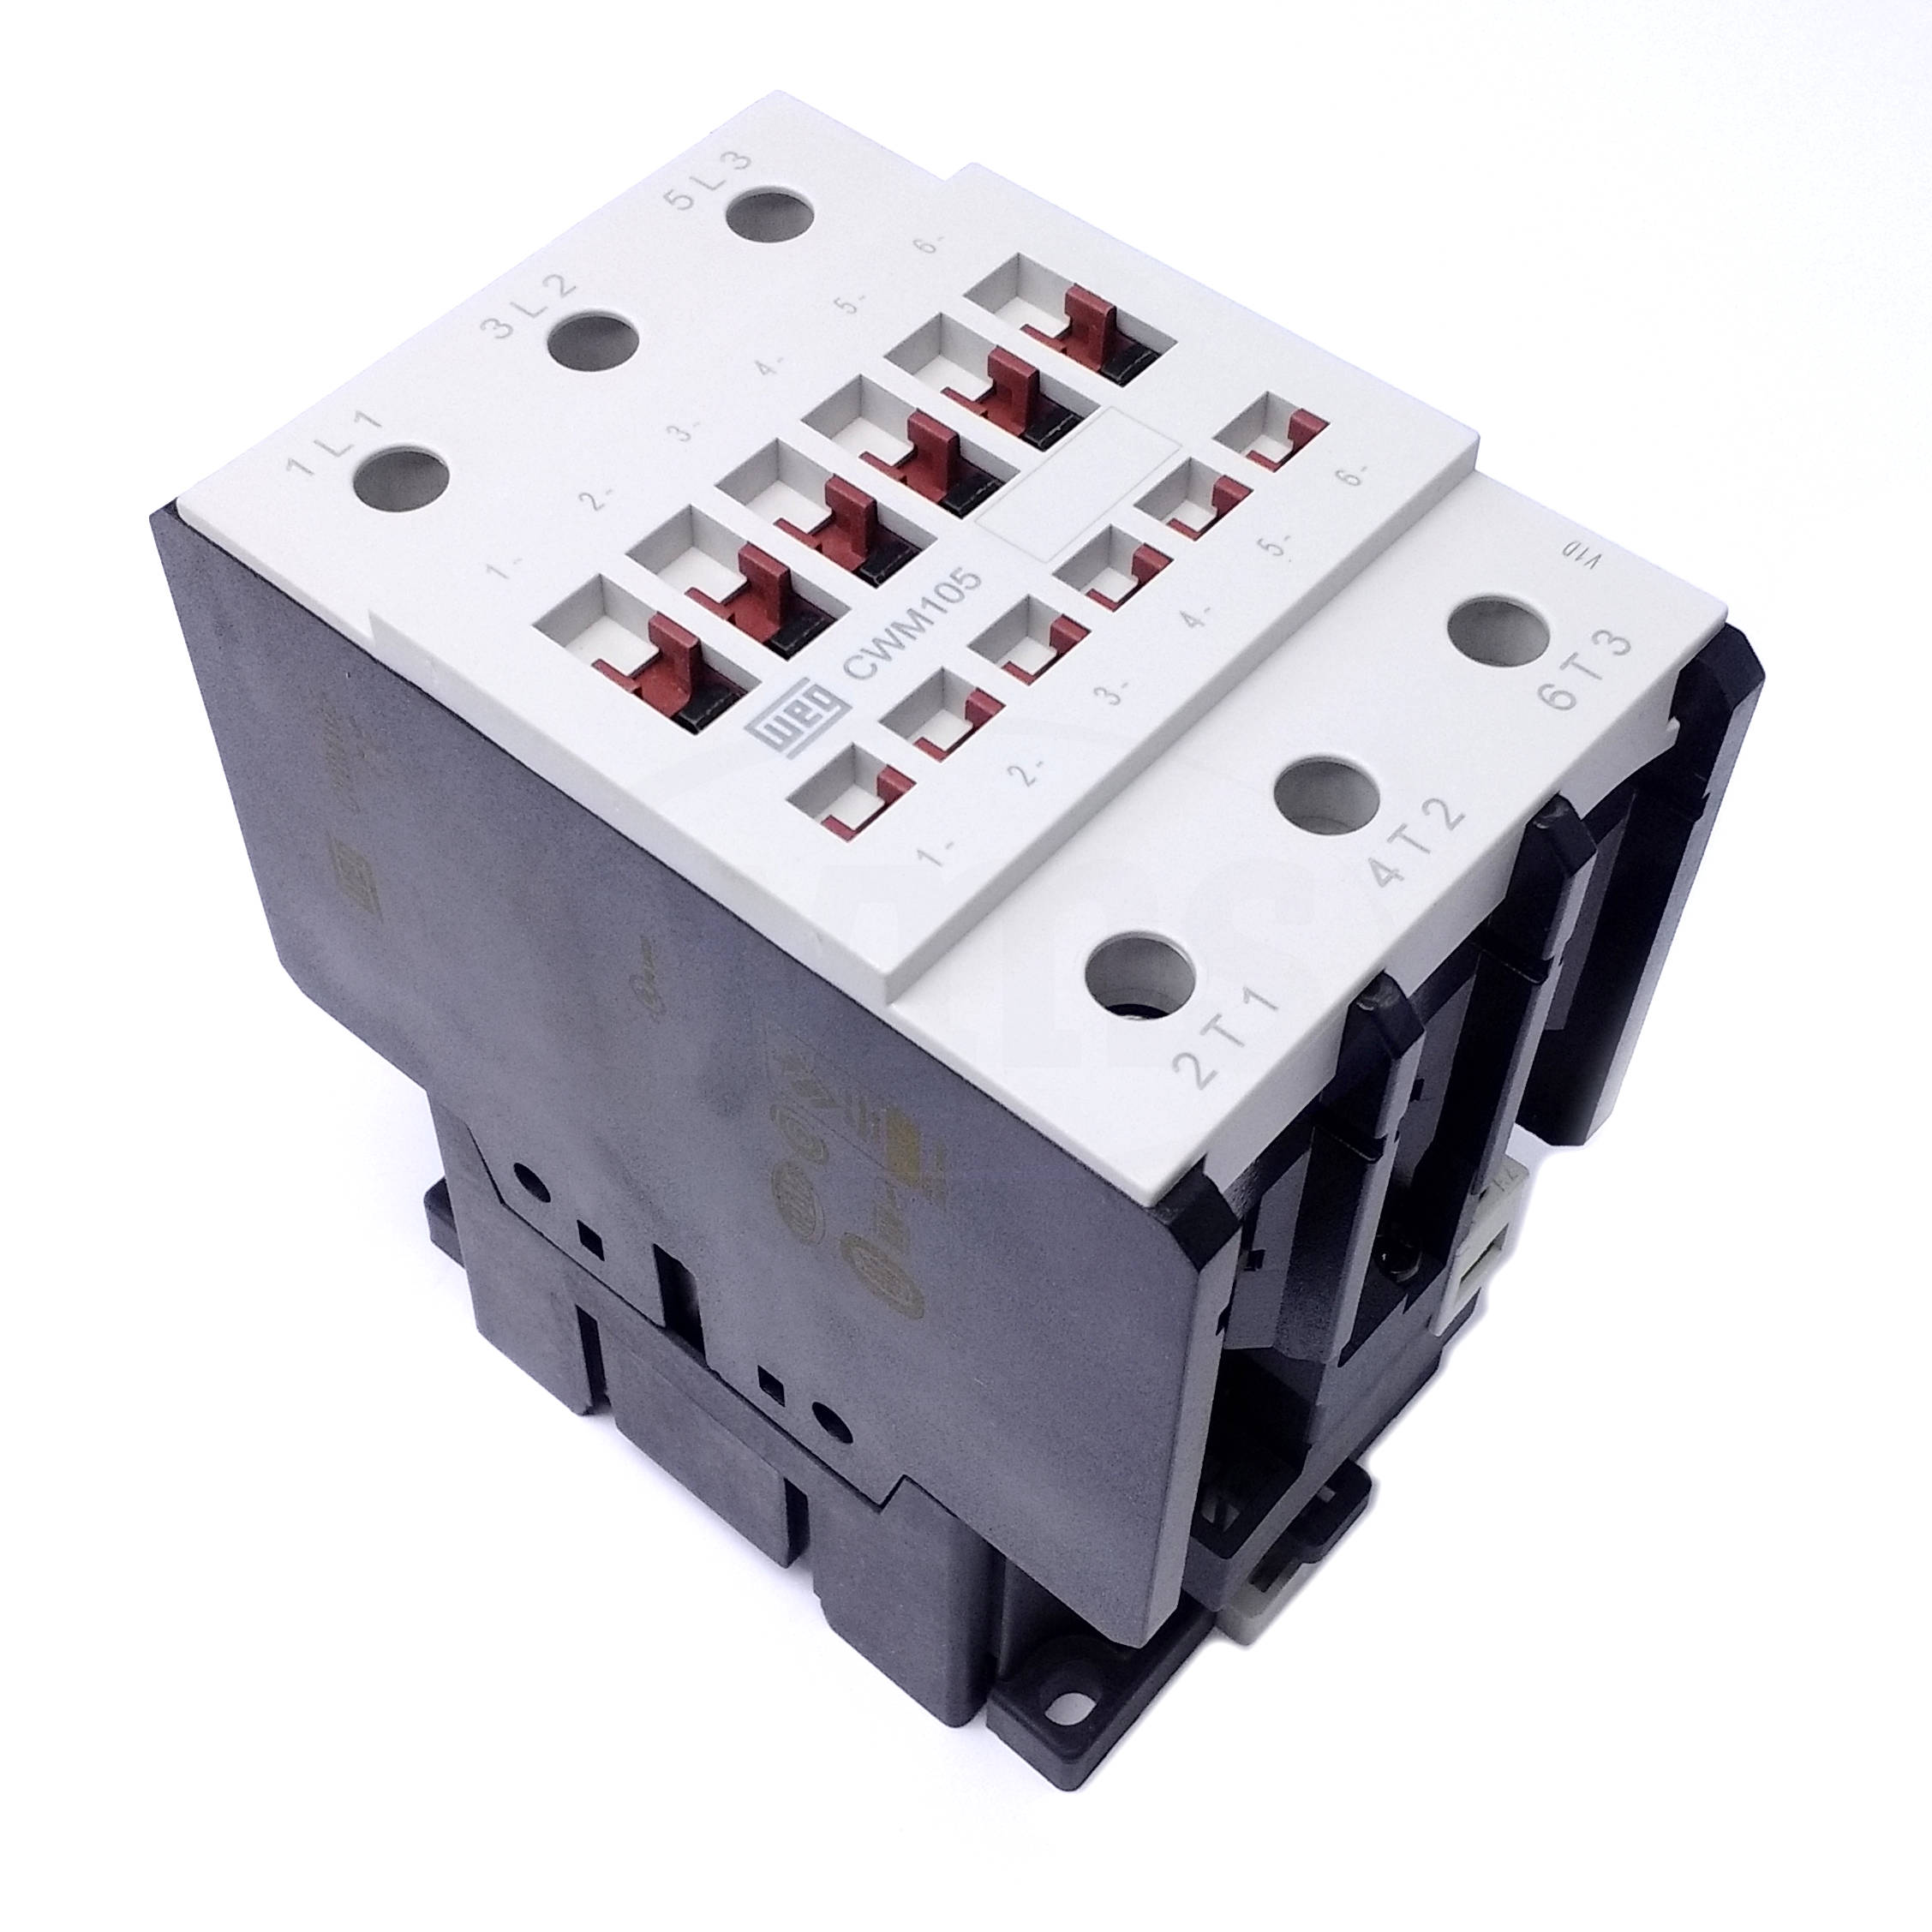 small resolution of cwm105 00 30c34 weg 3 pole iec standard contactor pvs3 open close stop switch wiring understanding a size 00 contactor wiring